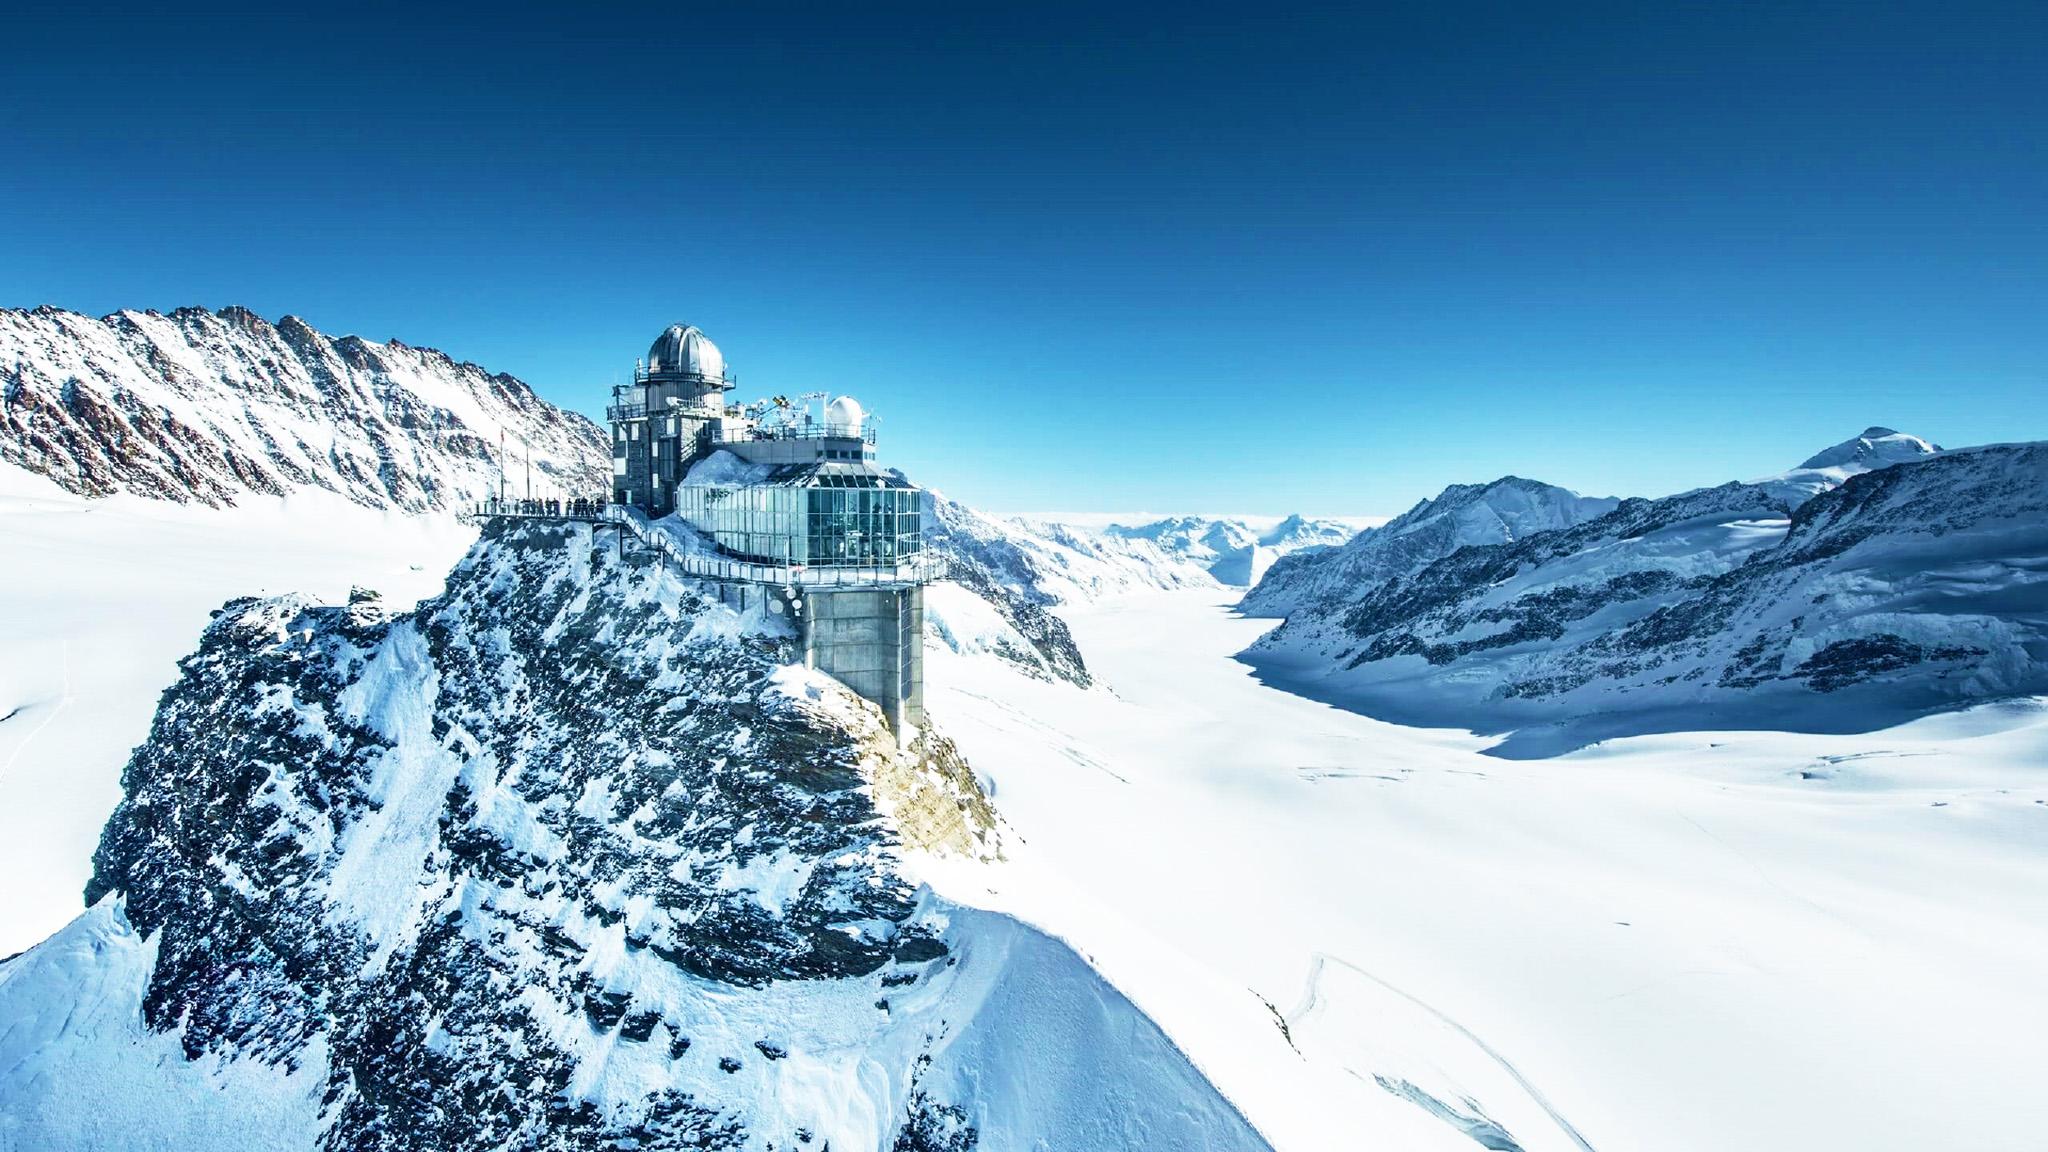 kt_2020_360_Keytours_excursions_Swisstours_interlaken_jungfraujoch3_2048_10